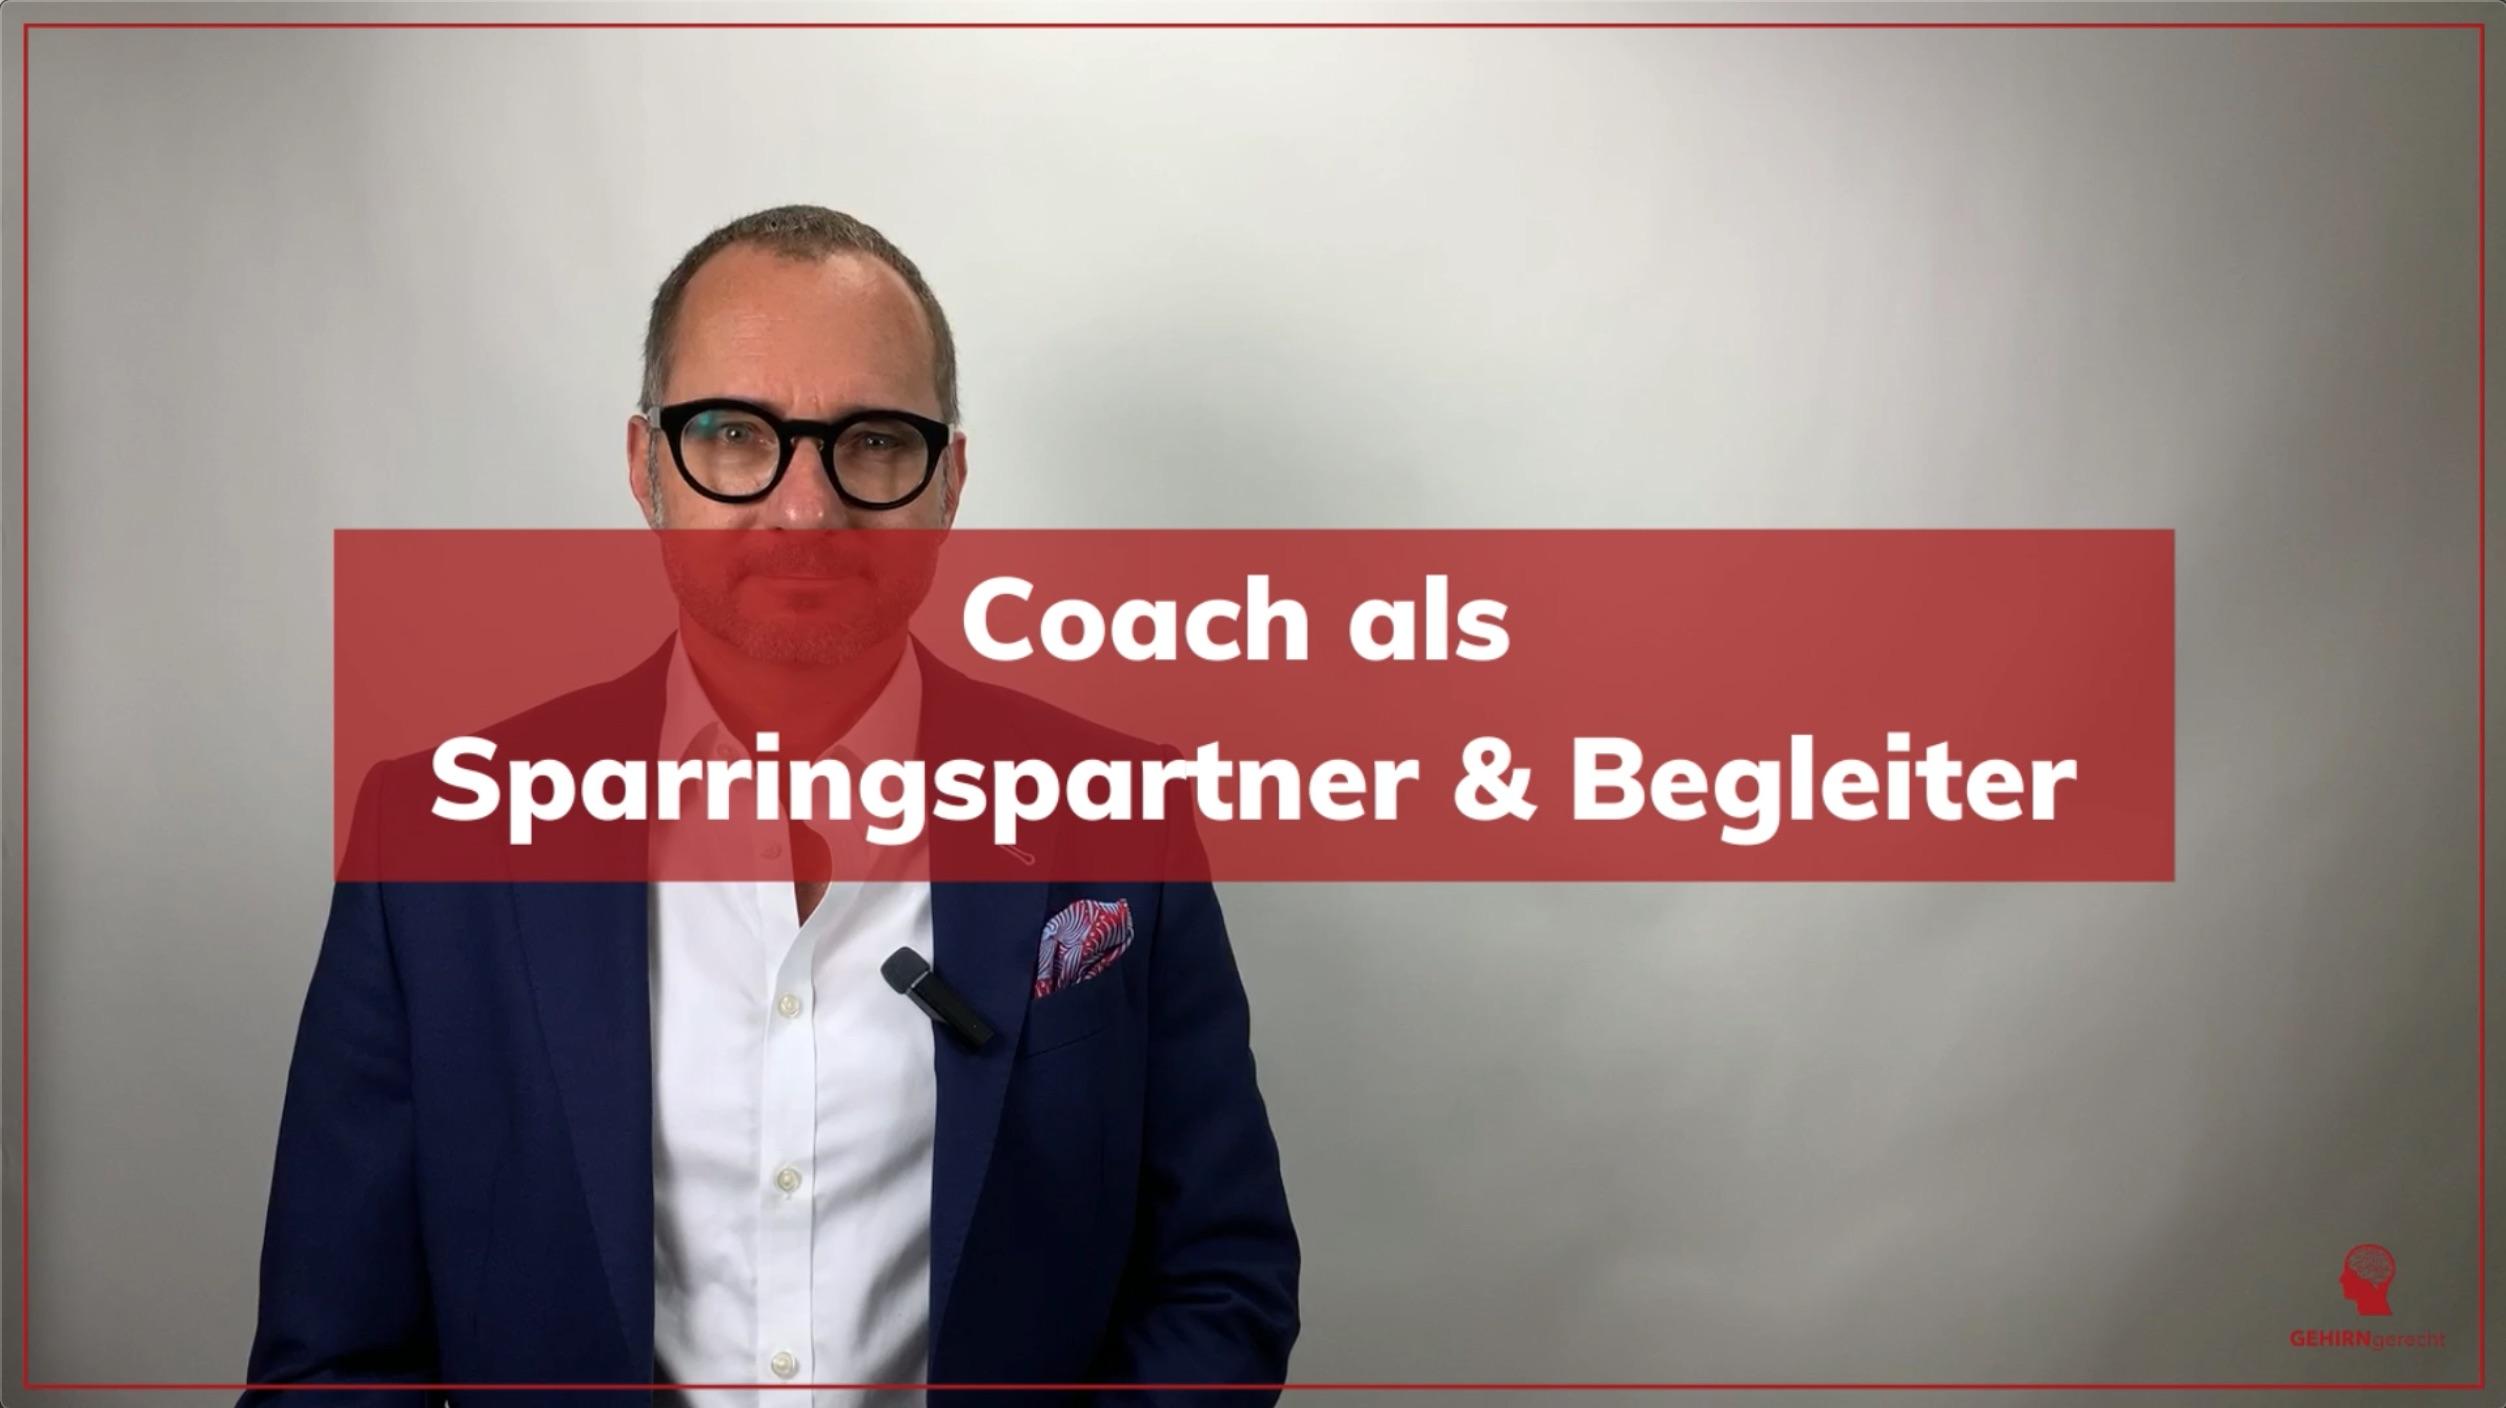 Coach als Sparringspartner